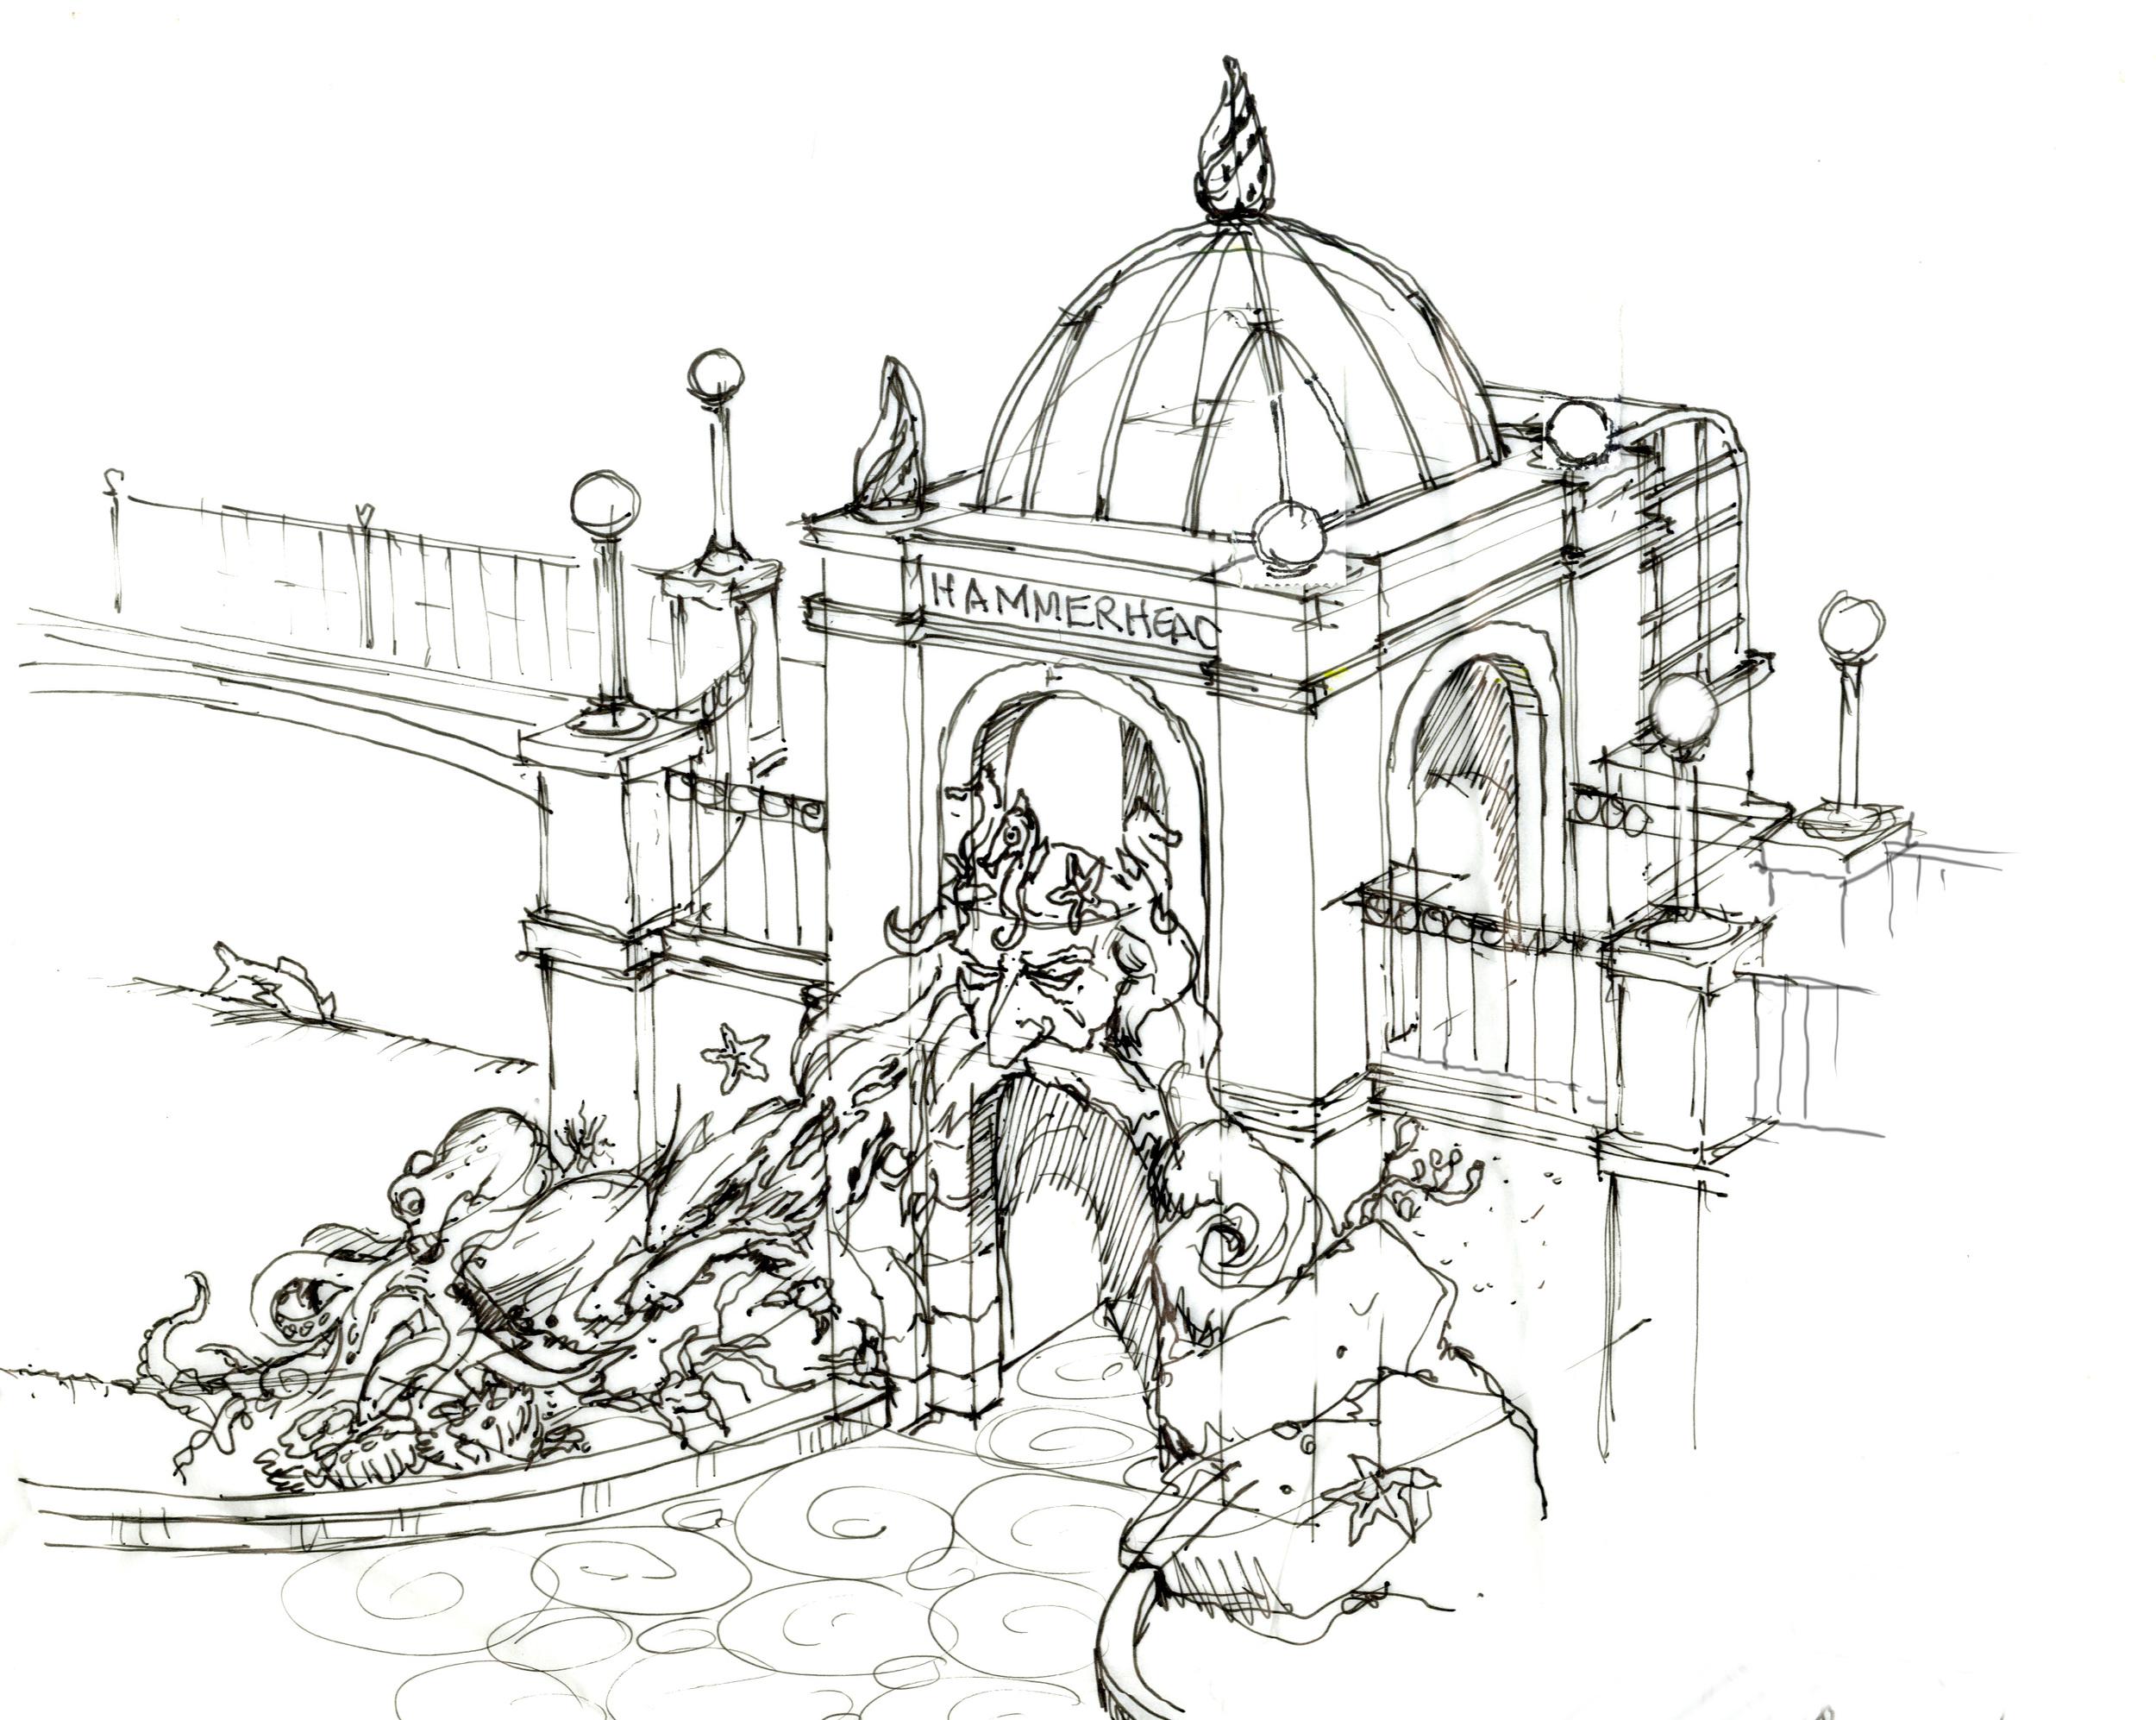 Hammerhead Entry sketch 3388176019[K].jpg